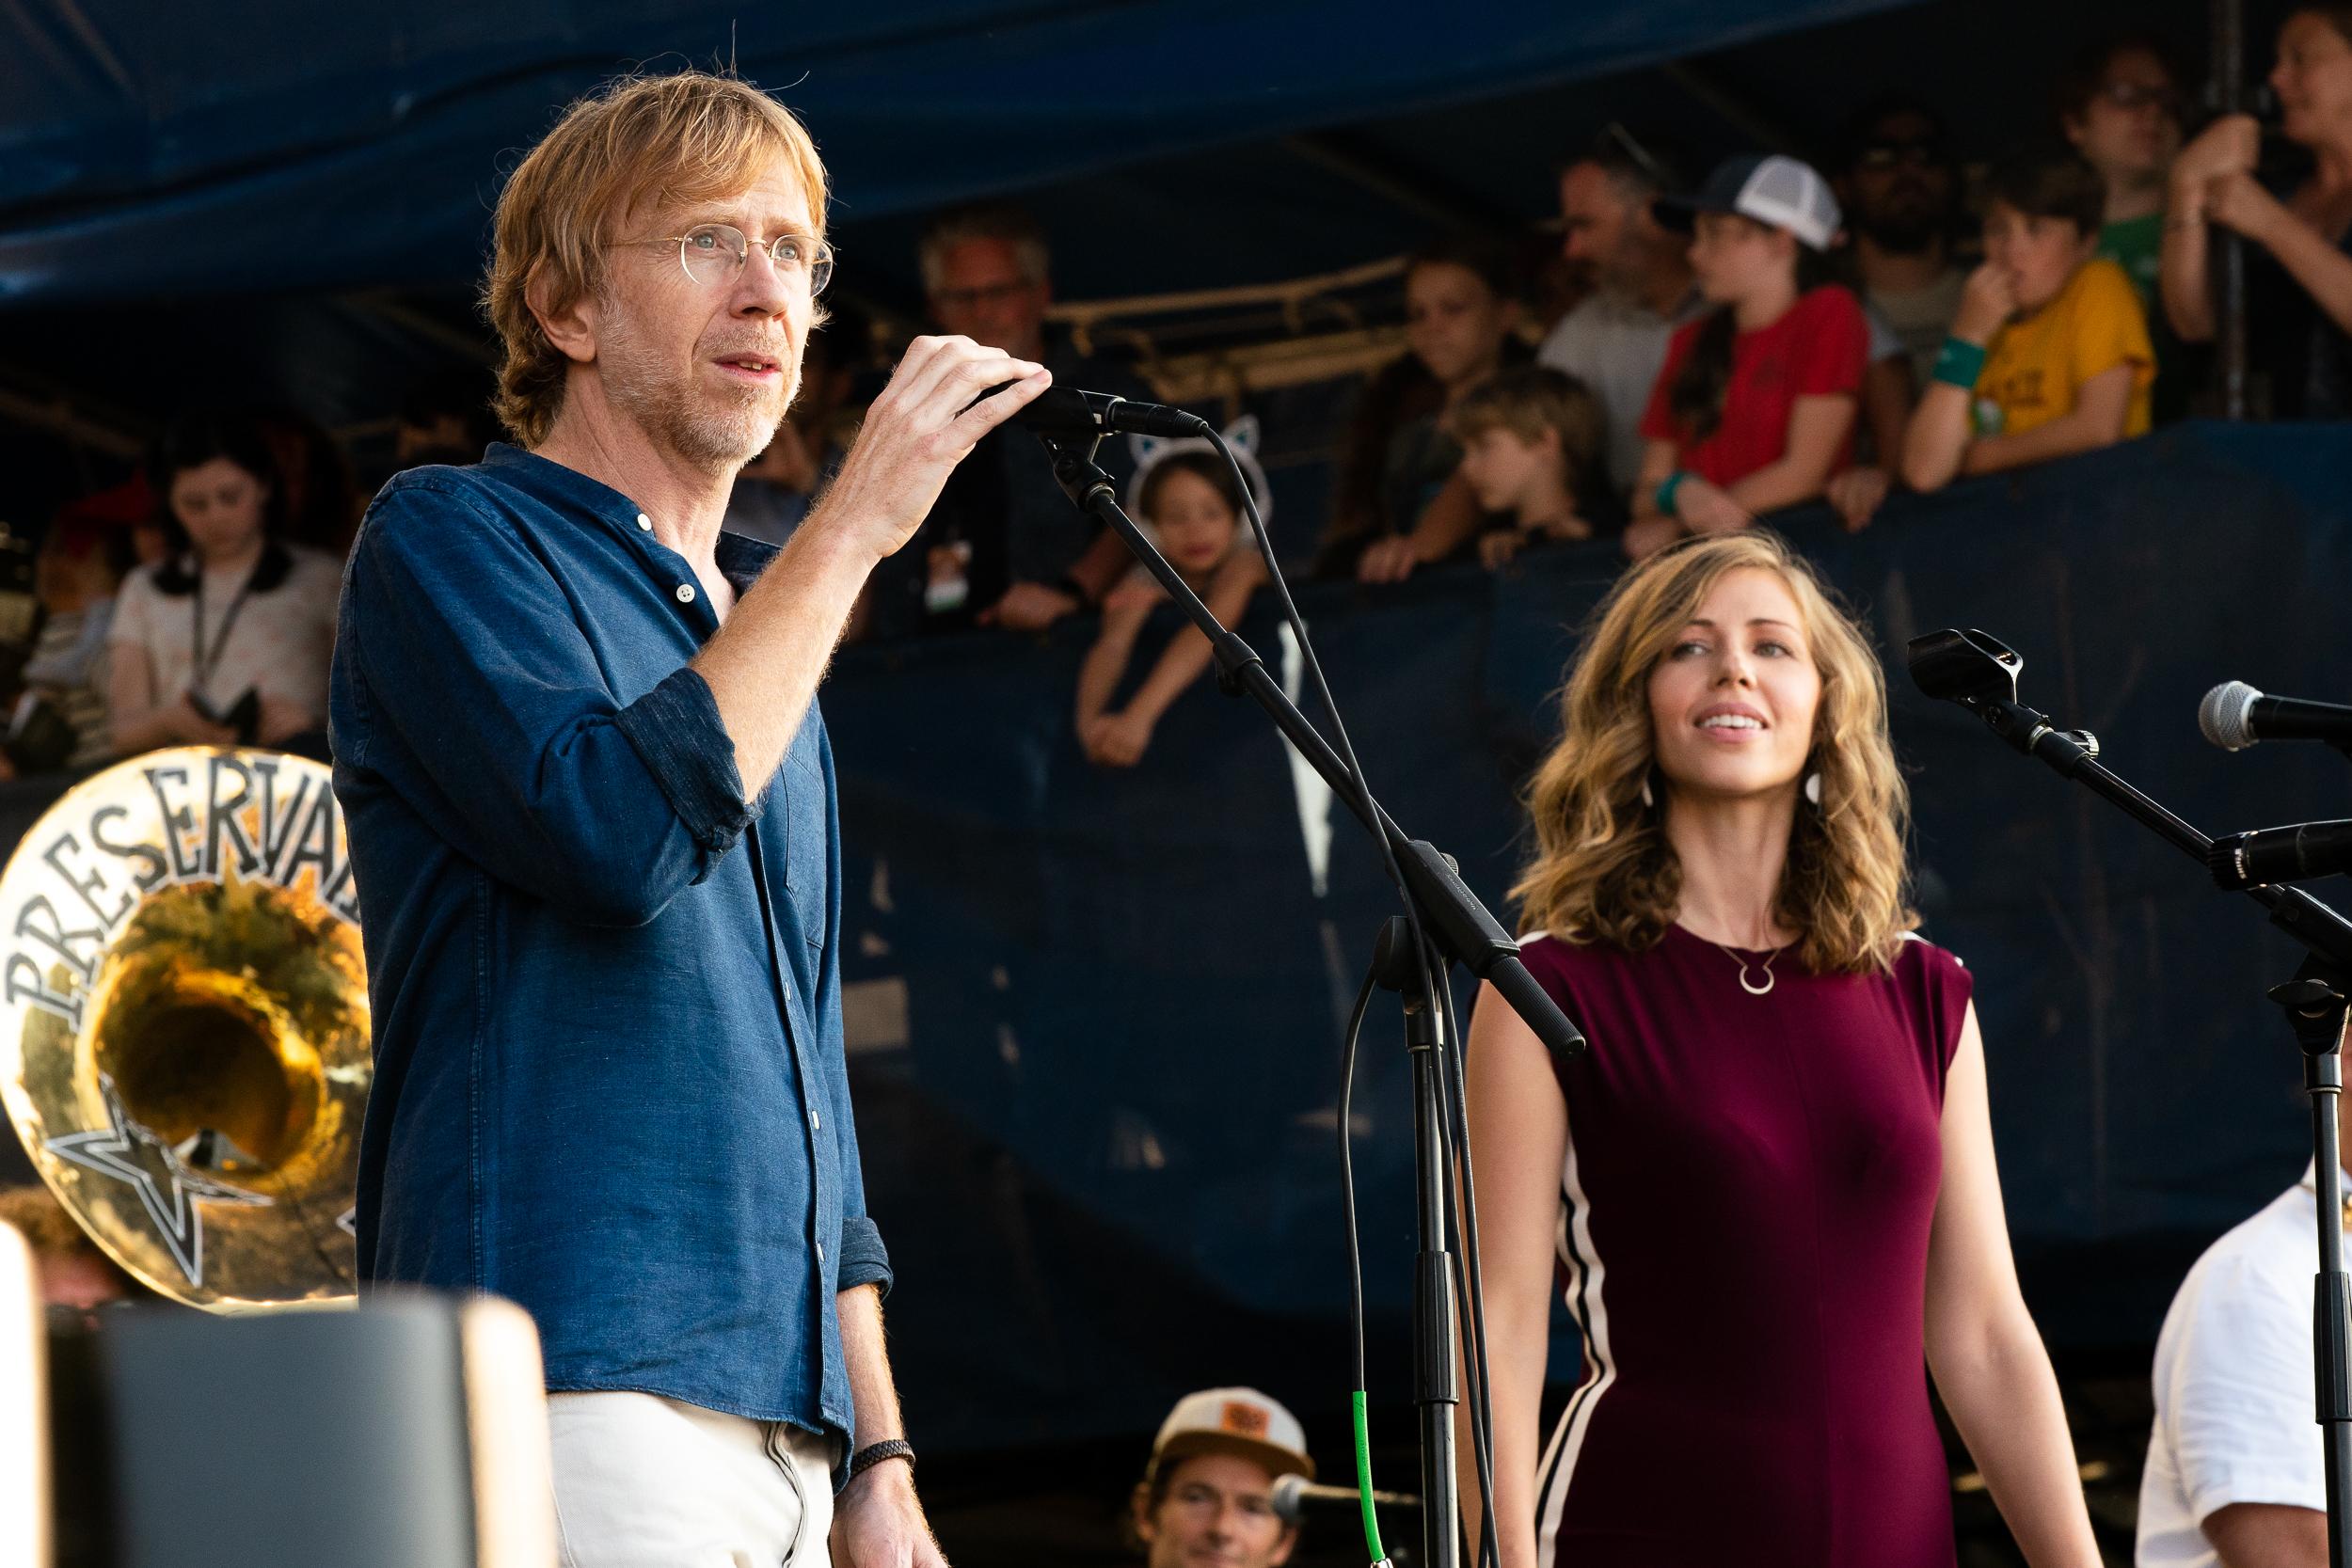 Trey Anastasio and Rachel Price at Newport Folk Festival (Photo by Mauricio Castro)